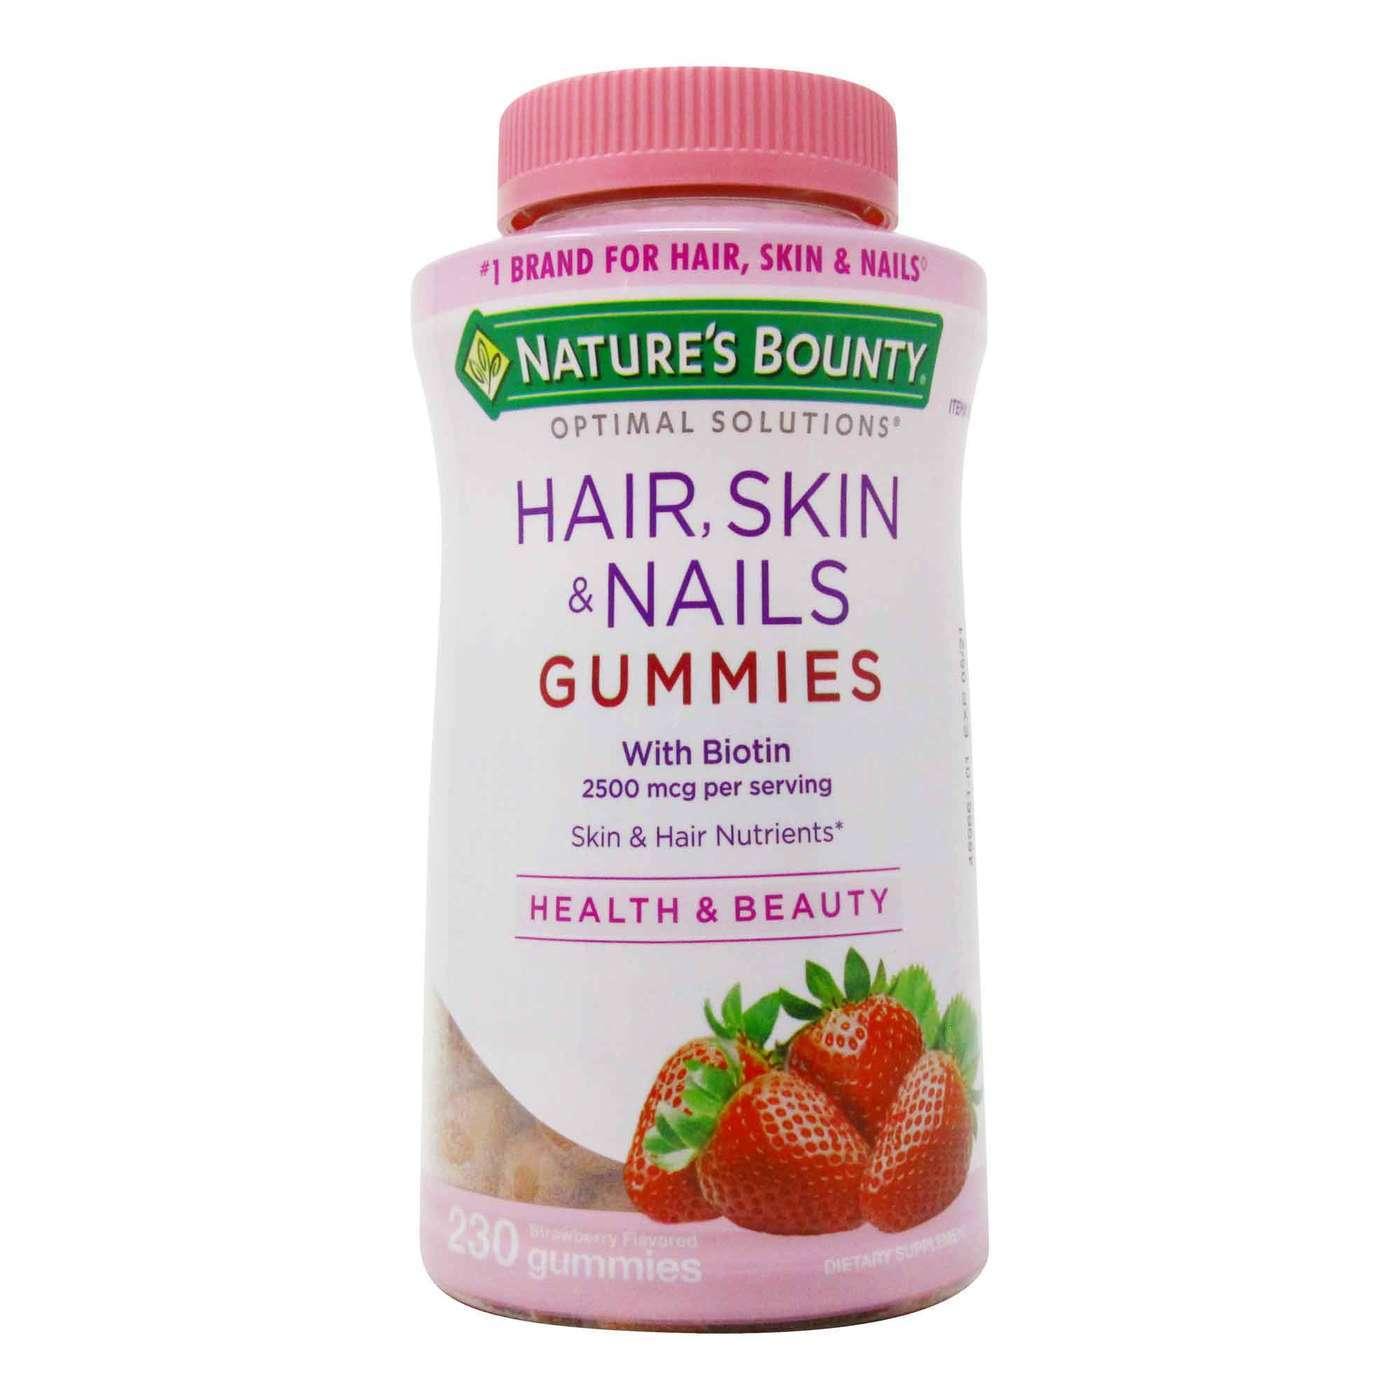 Natures Bounty Vitamina Hair Skin Nails 2500 mcg 230 Gummies